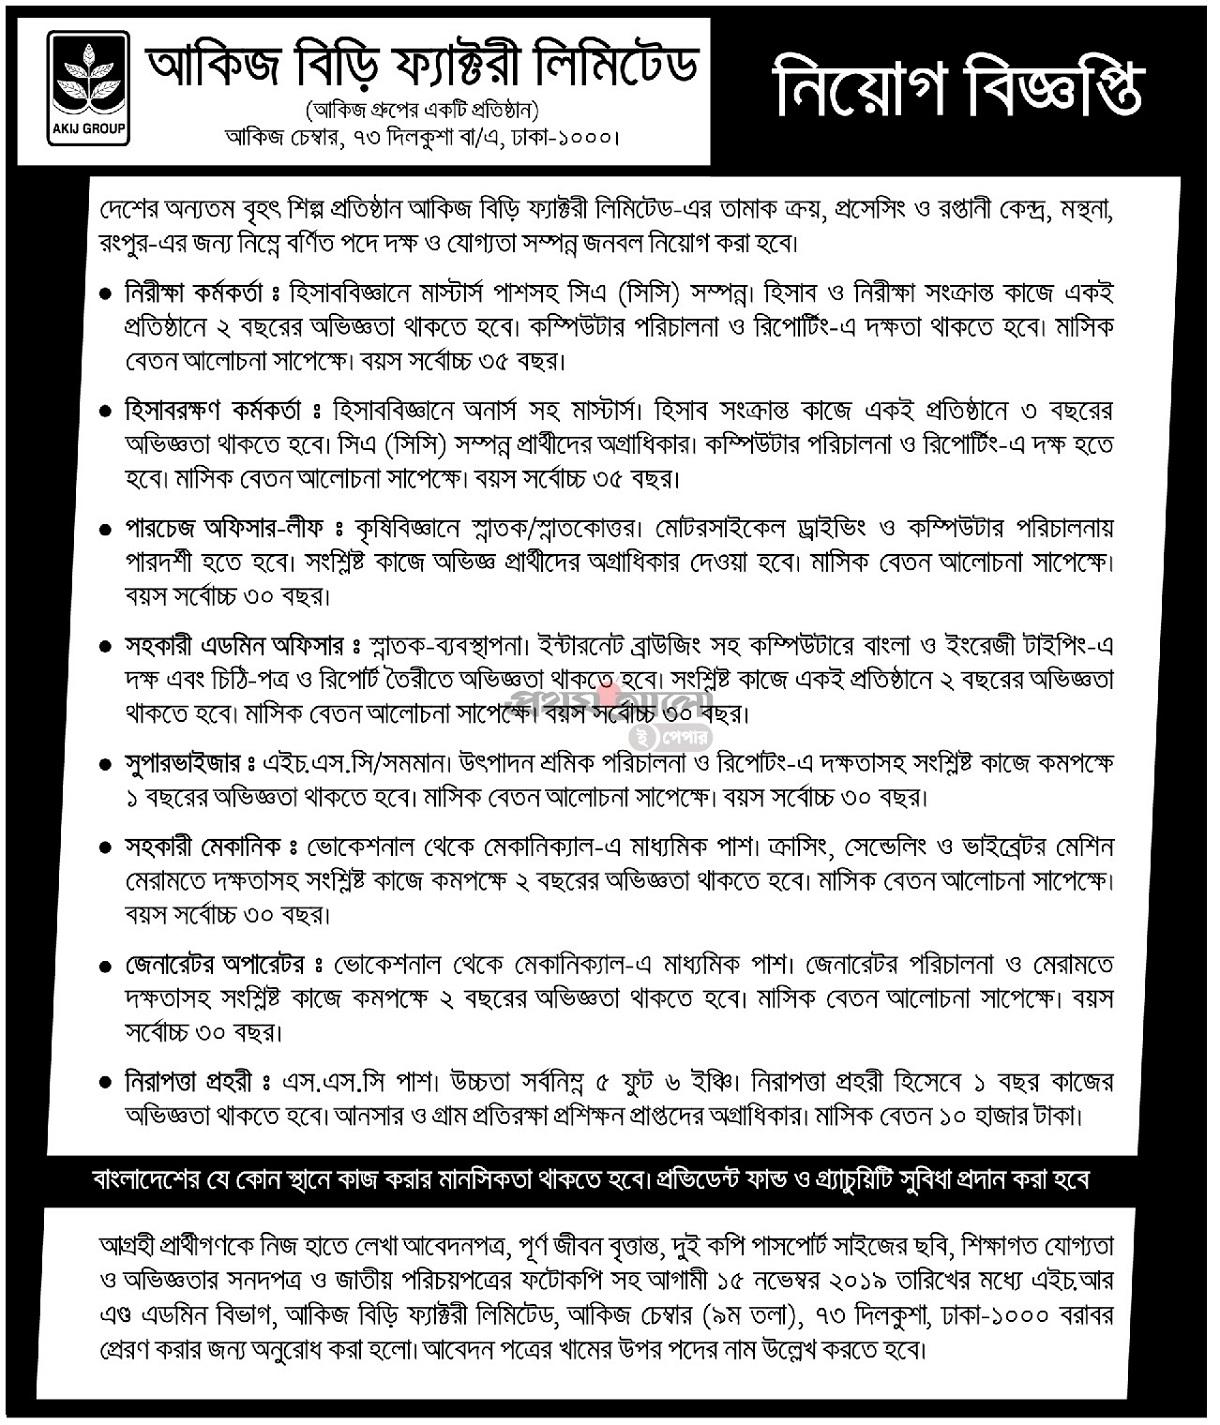 Akij Biri Factory Limited Job Circular 2019